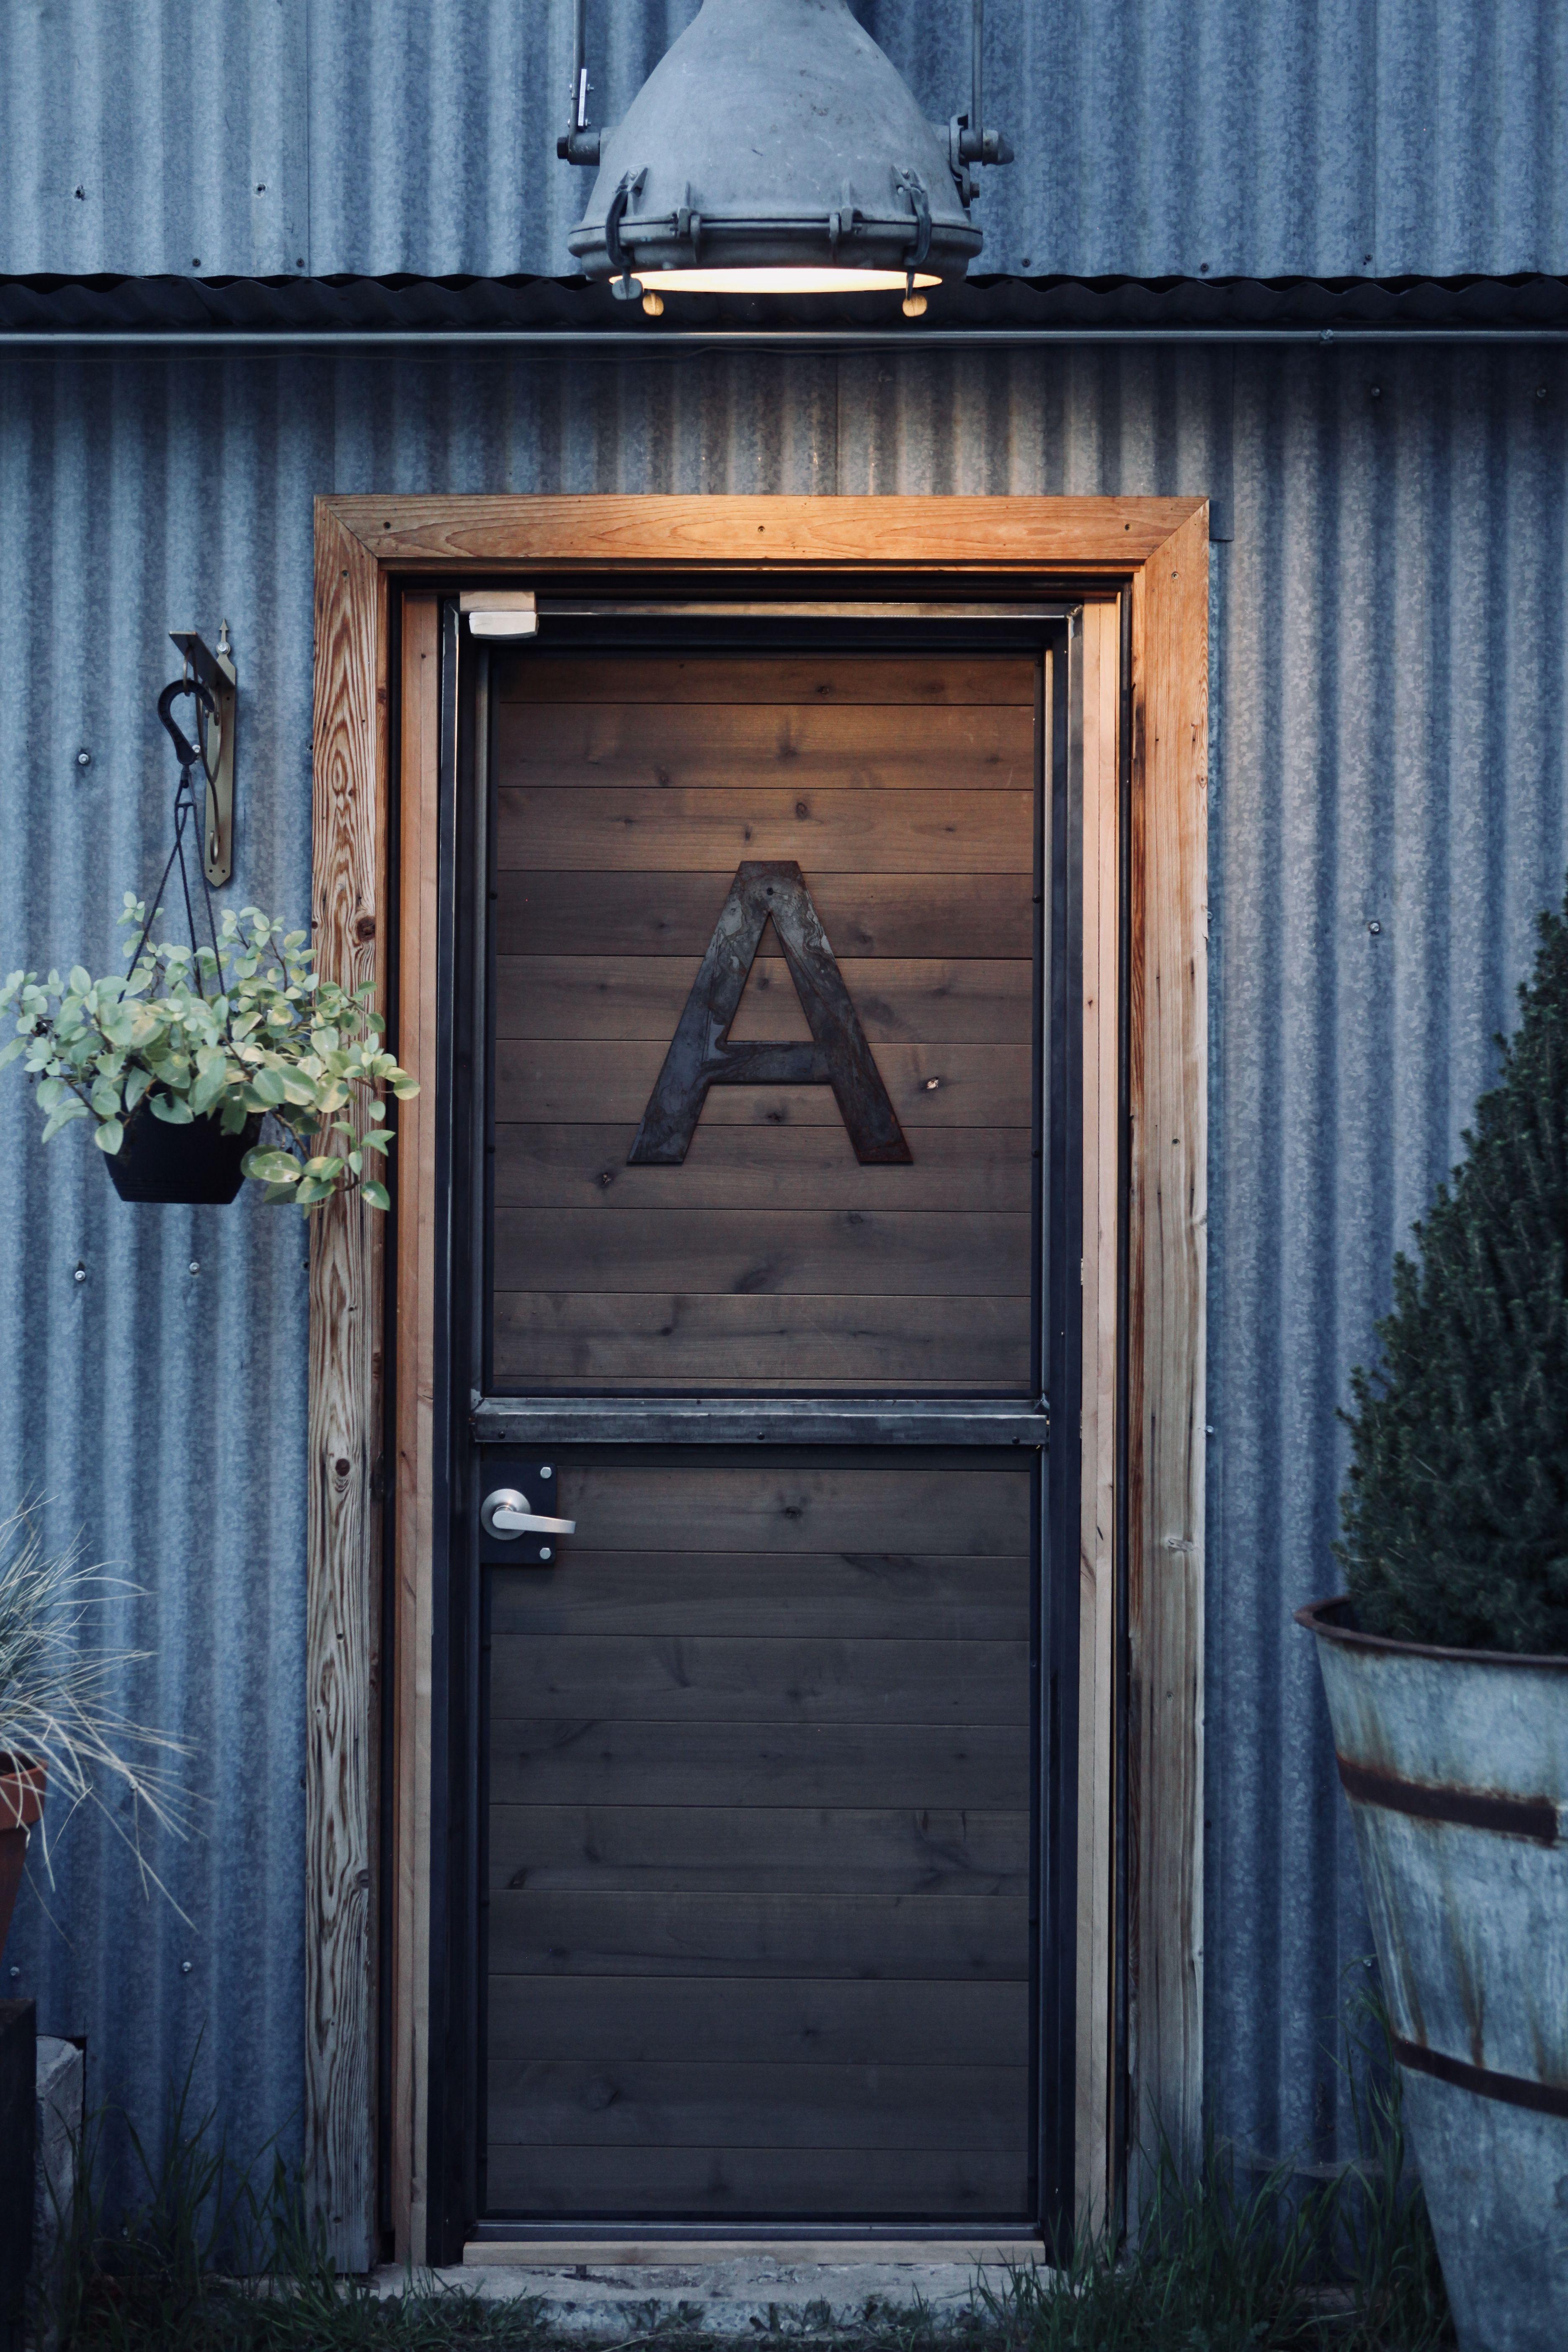 Introducing the Rustica Modern Dutch Door! Yes, the top